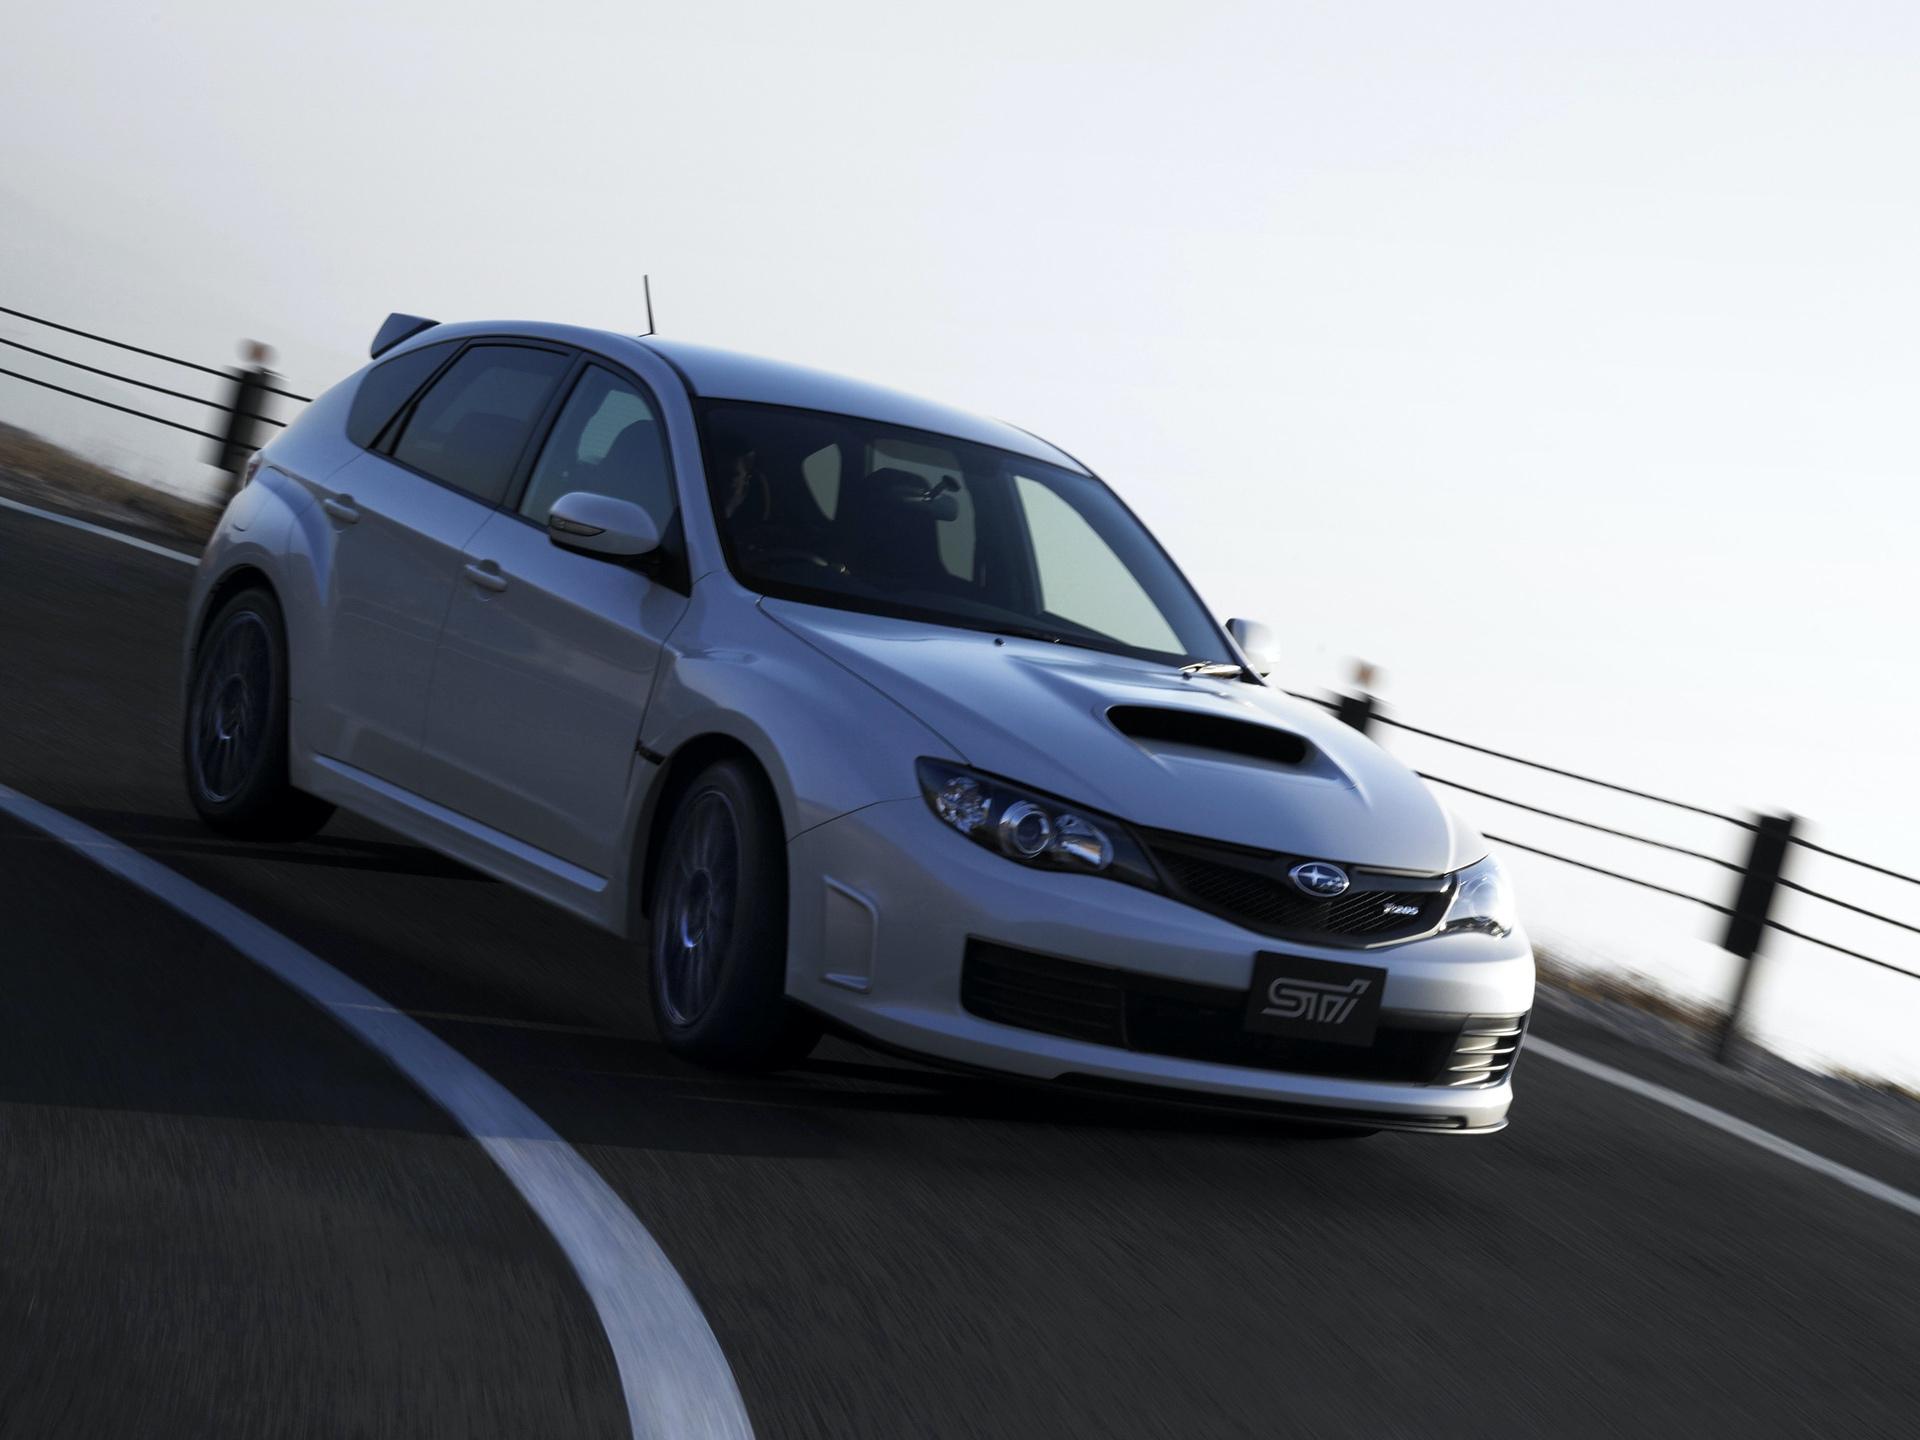 Subaru_Impreza_STI_R205_0002